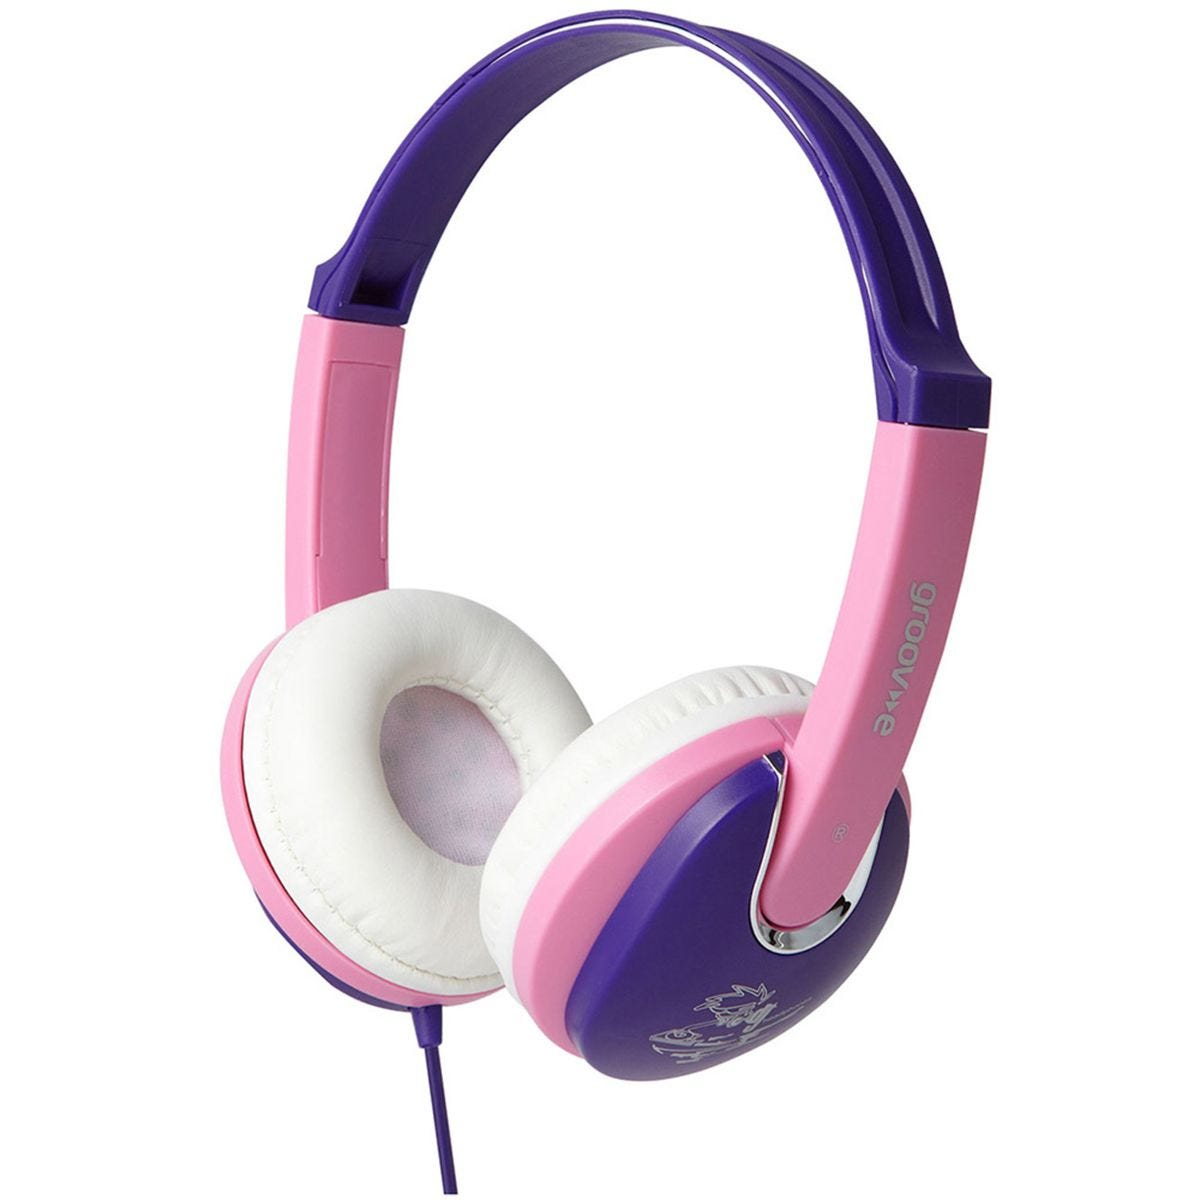 Groov-e Kiddiez DJ Style Headphone with 85dB Volume Limiter - Pink/Violet